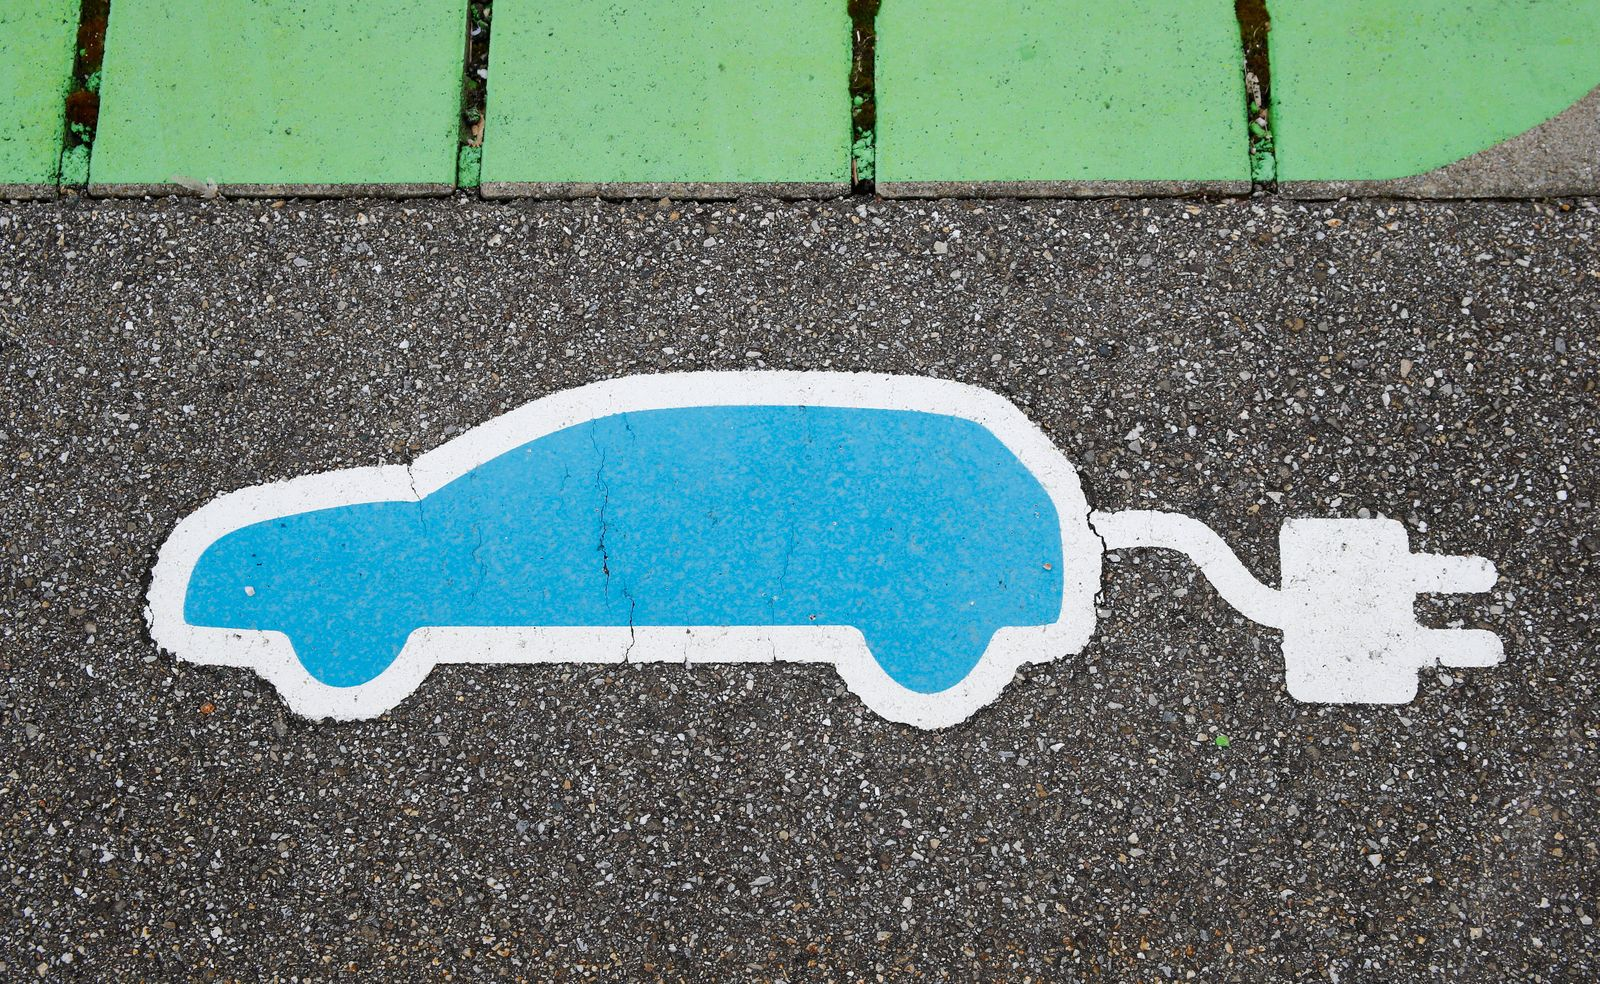 23.01.2020 Solothurn , SCHWEIZ , Symbolbild Elektromobilität *** 23 01 2020 Solothurn , SWITZERLAND , Electric mobility